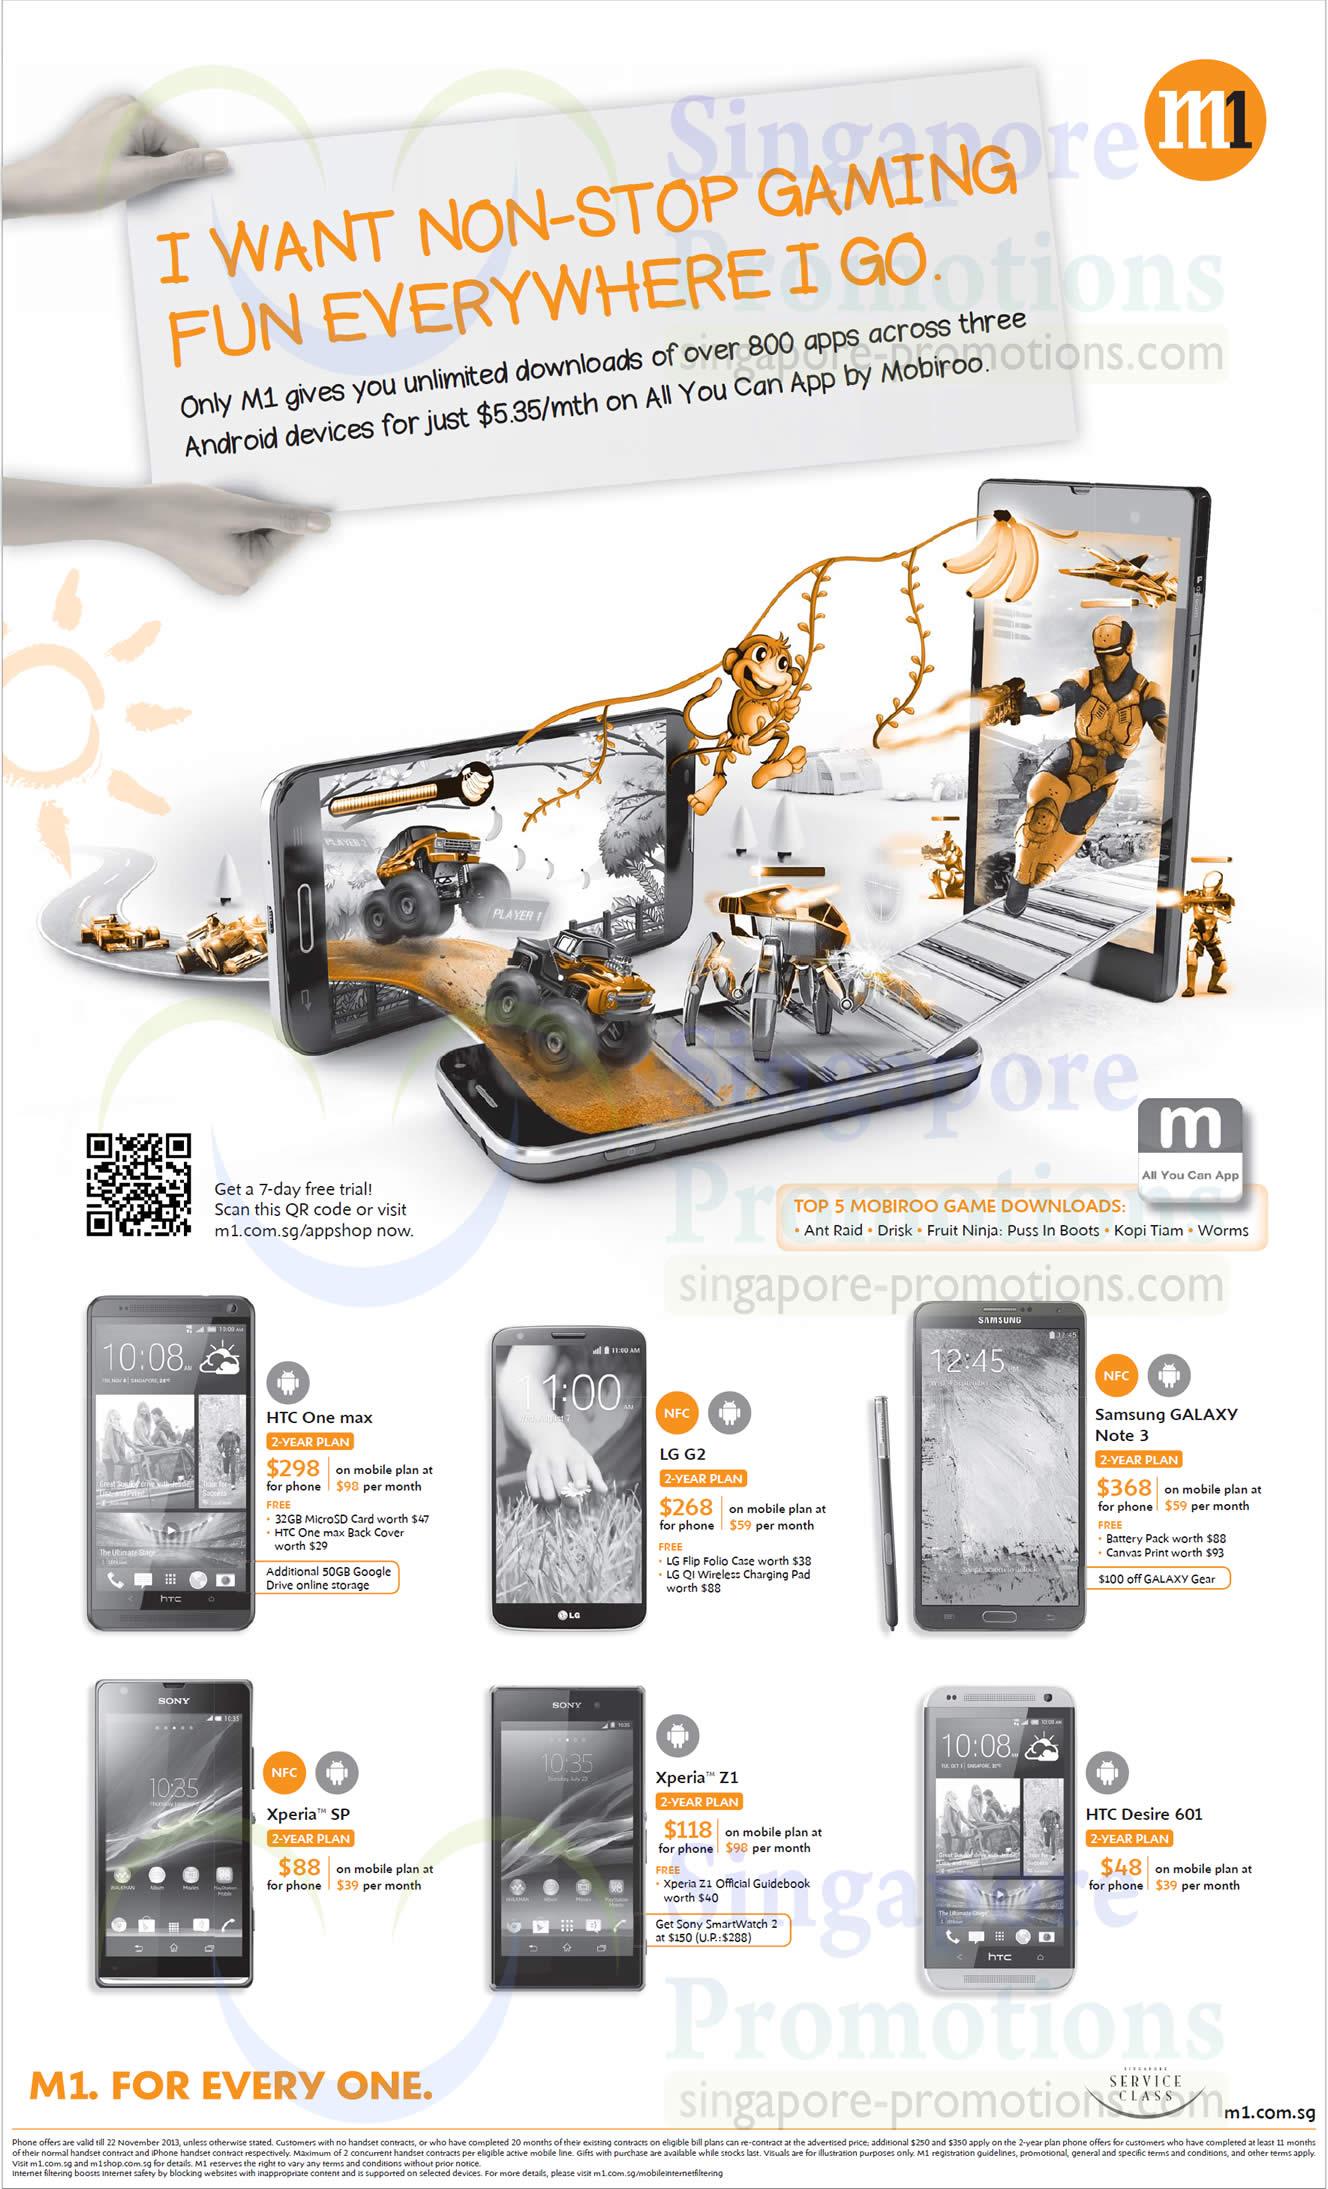 HTC One Max, Desire 601, LG G2, Samsung Galaxy Note 3, Sony Xperia SP, Sony Xperia Z1